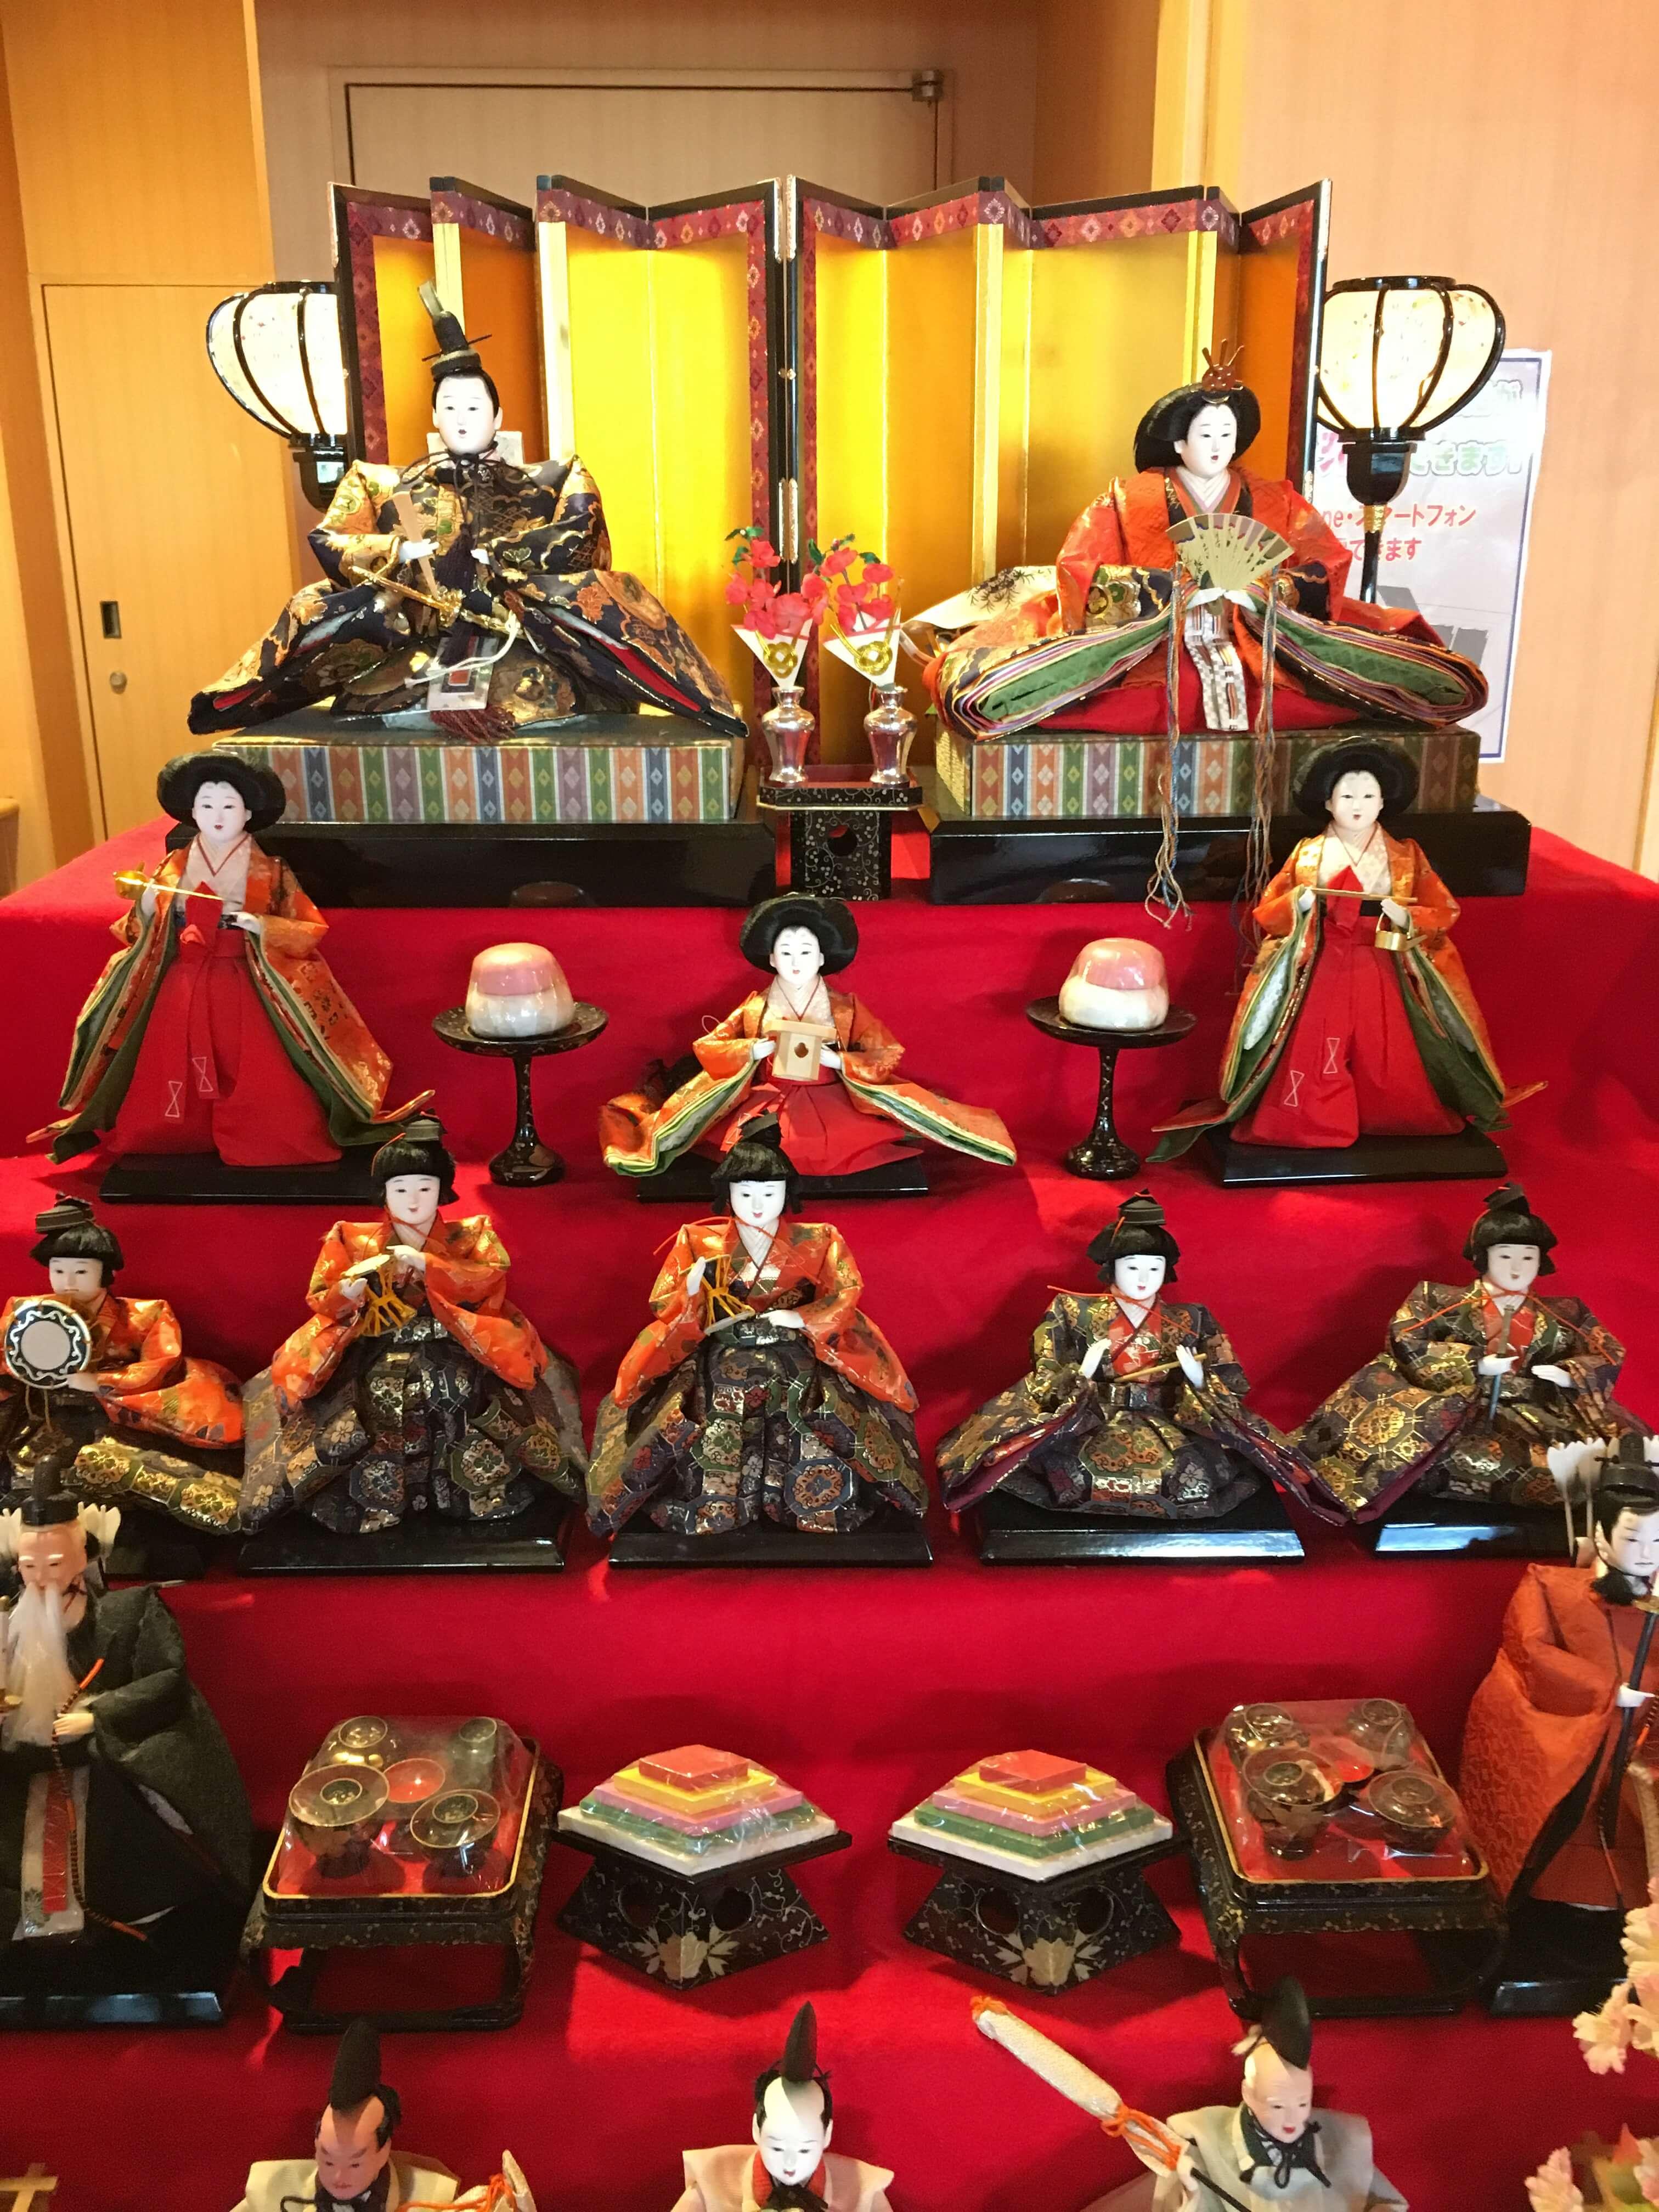 龍宮城ホテル三日月 雛人形